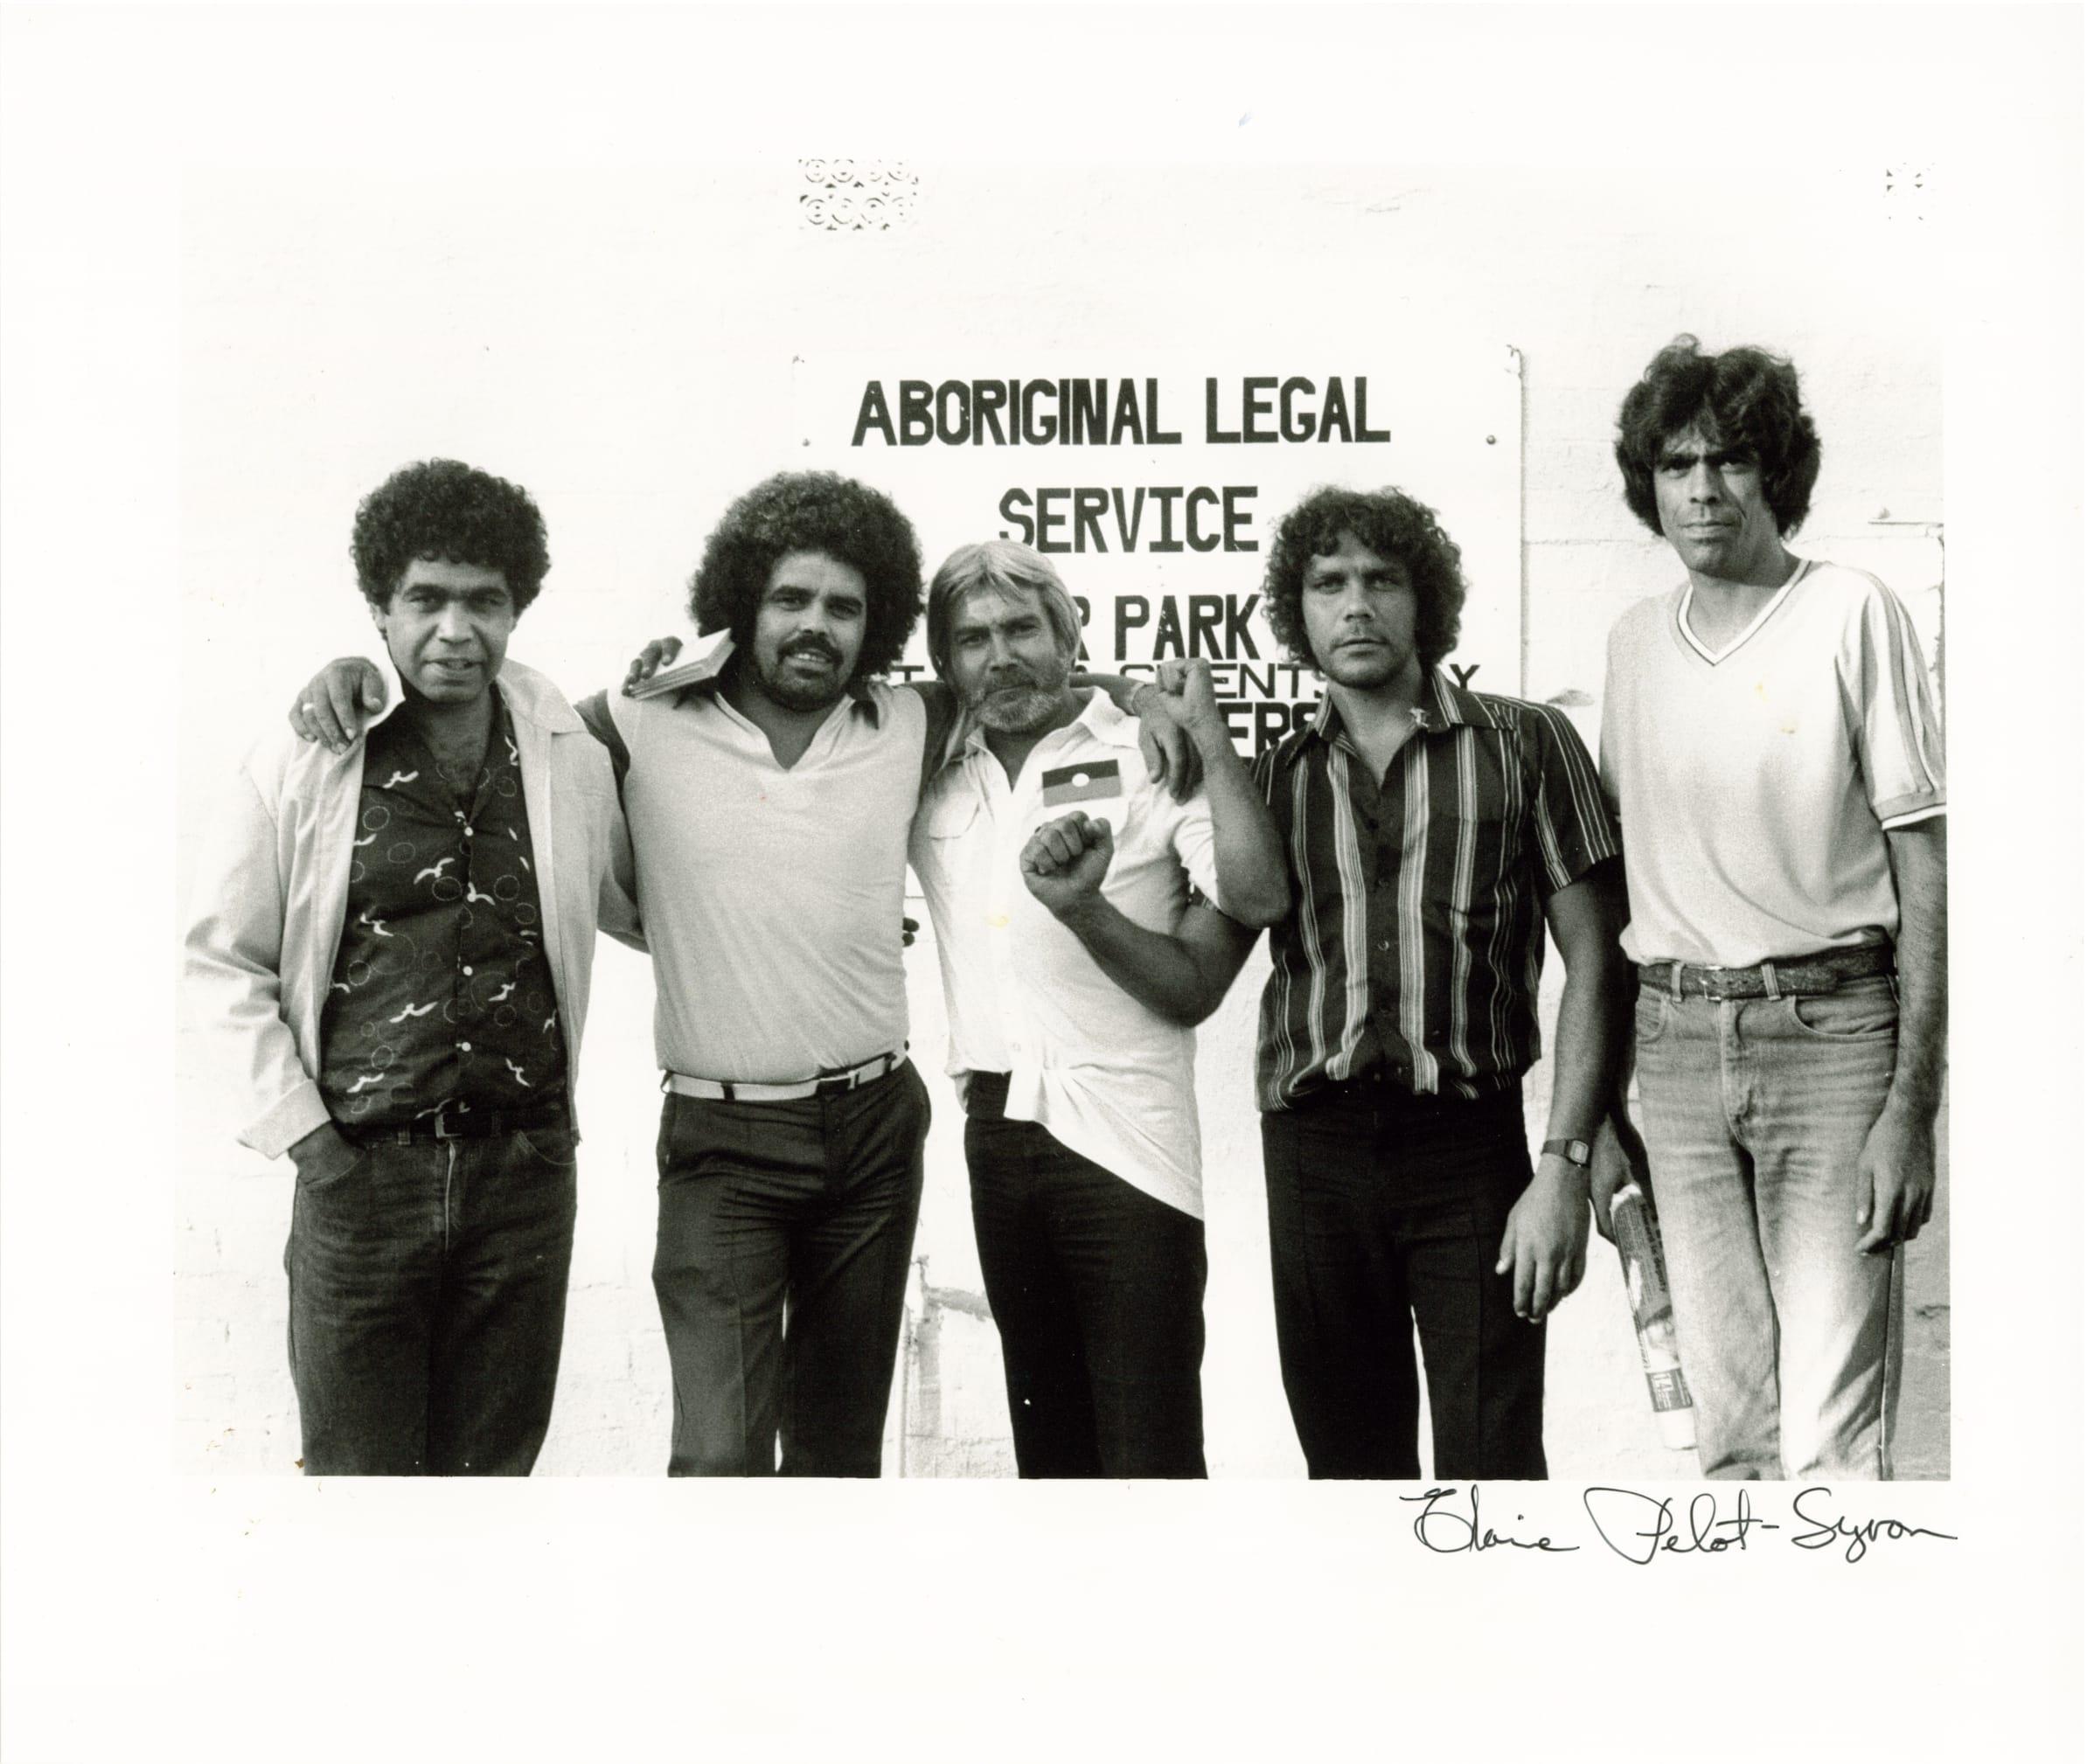 Arnold Williams, Lyall Munro Jr, Cecil Patten, Kenny Weldon and Dan Munro.